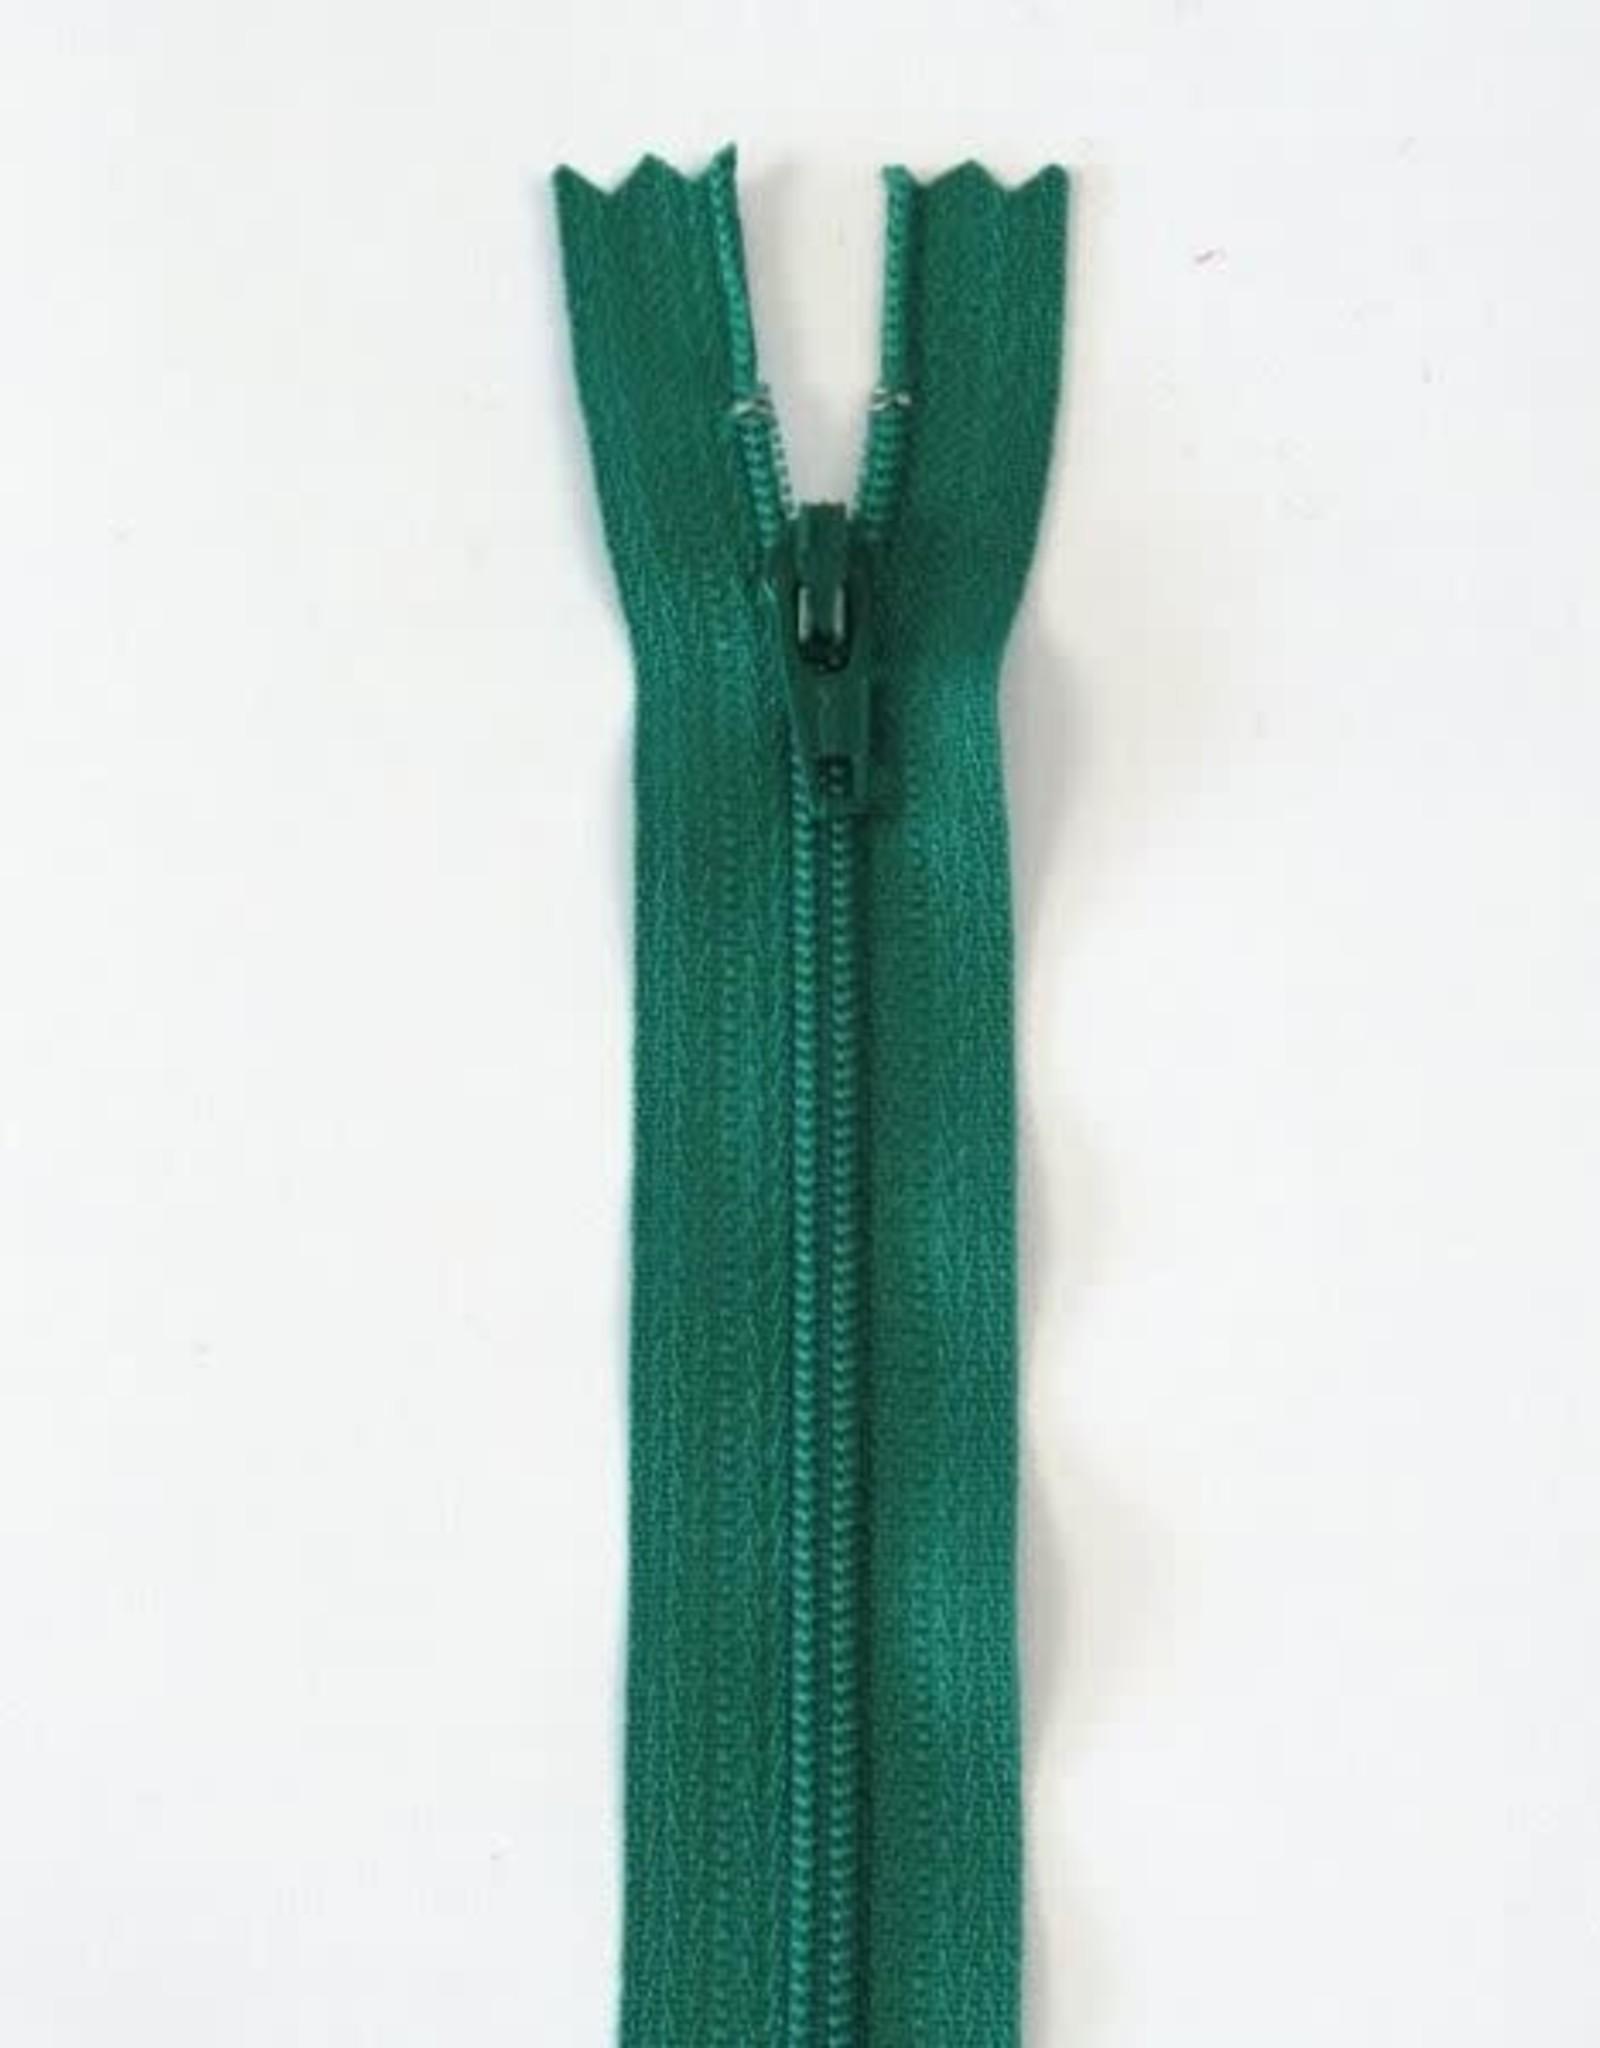 YKK Spiraalrits niet-DB 3mm grasgroen 540-35cm